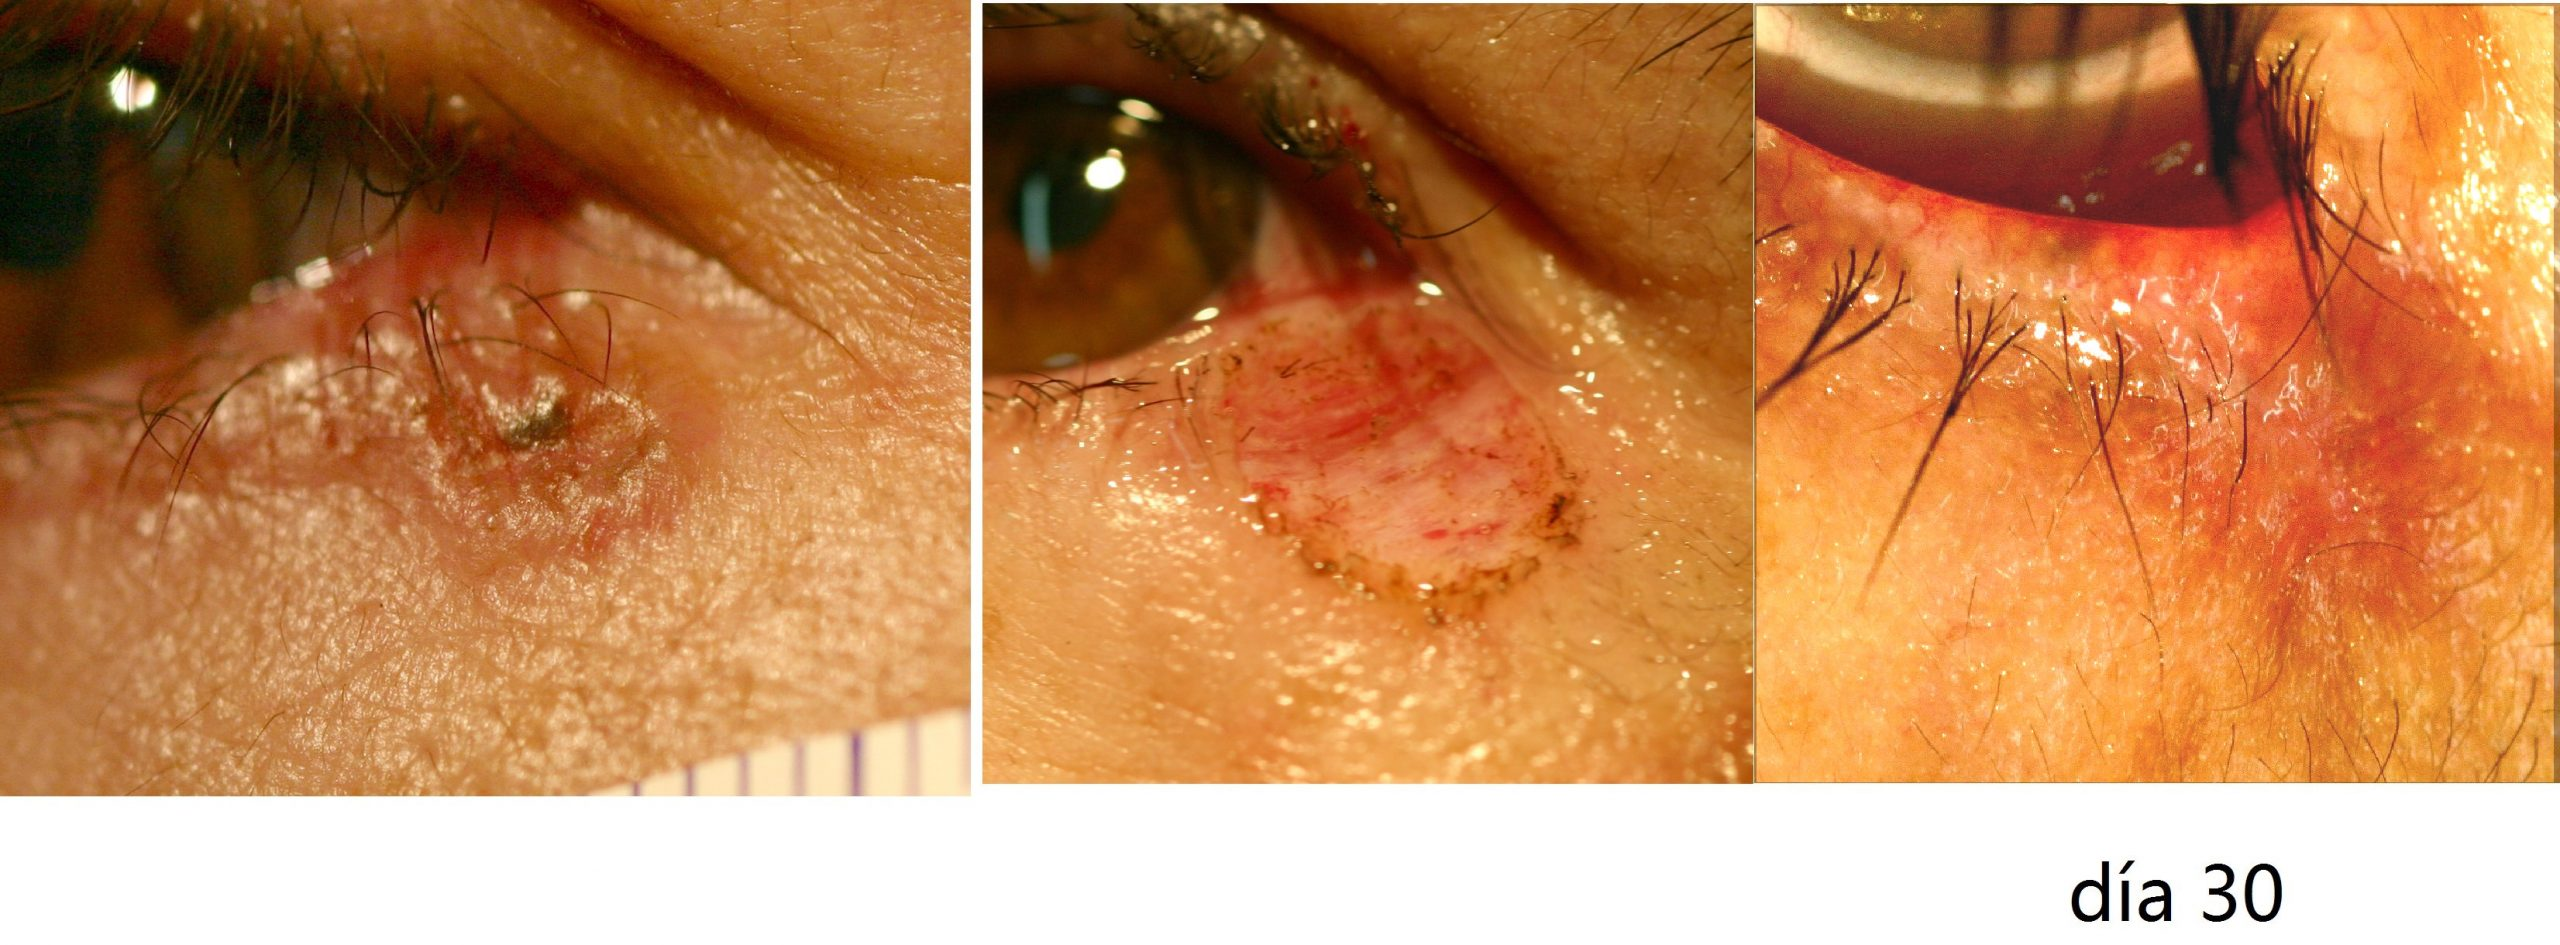 Biopsia carcinoma basocelular